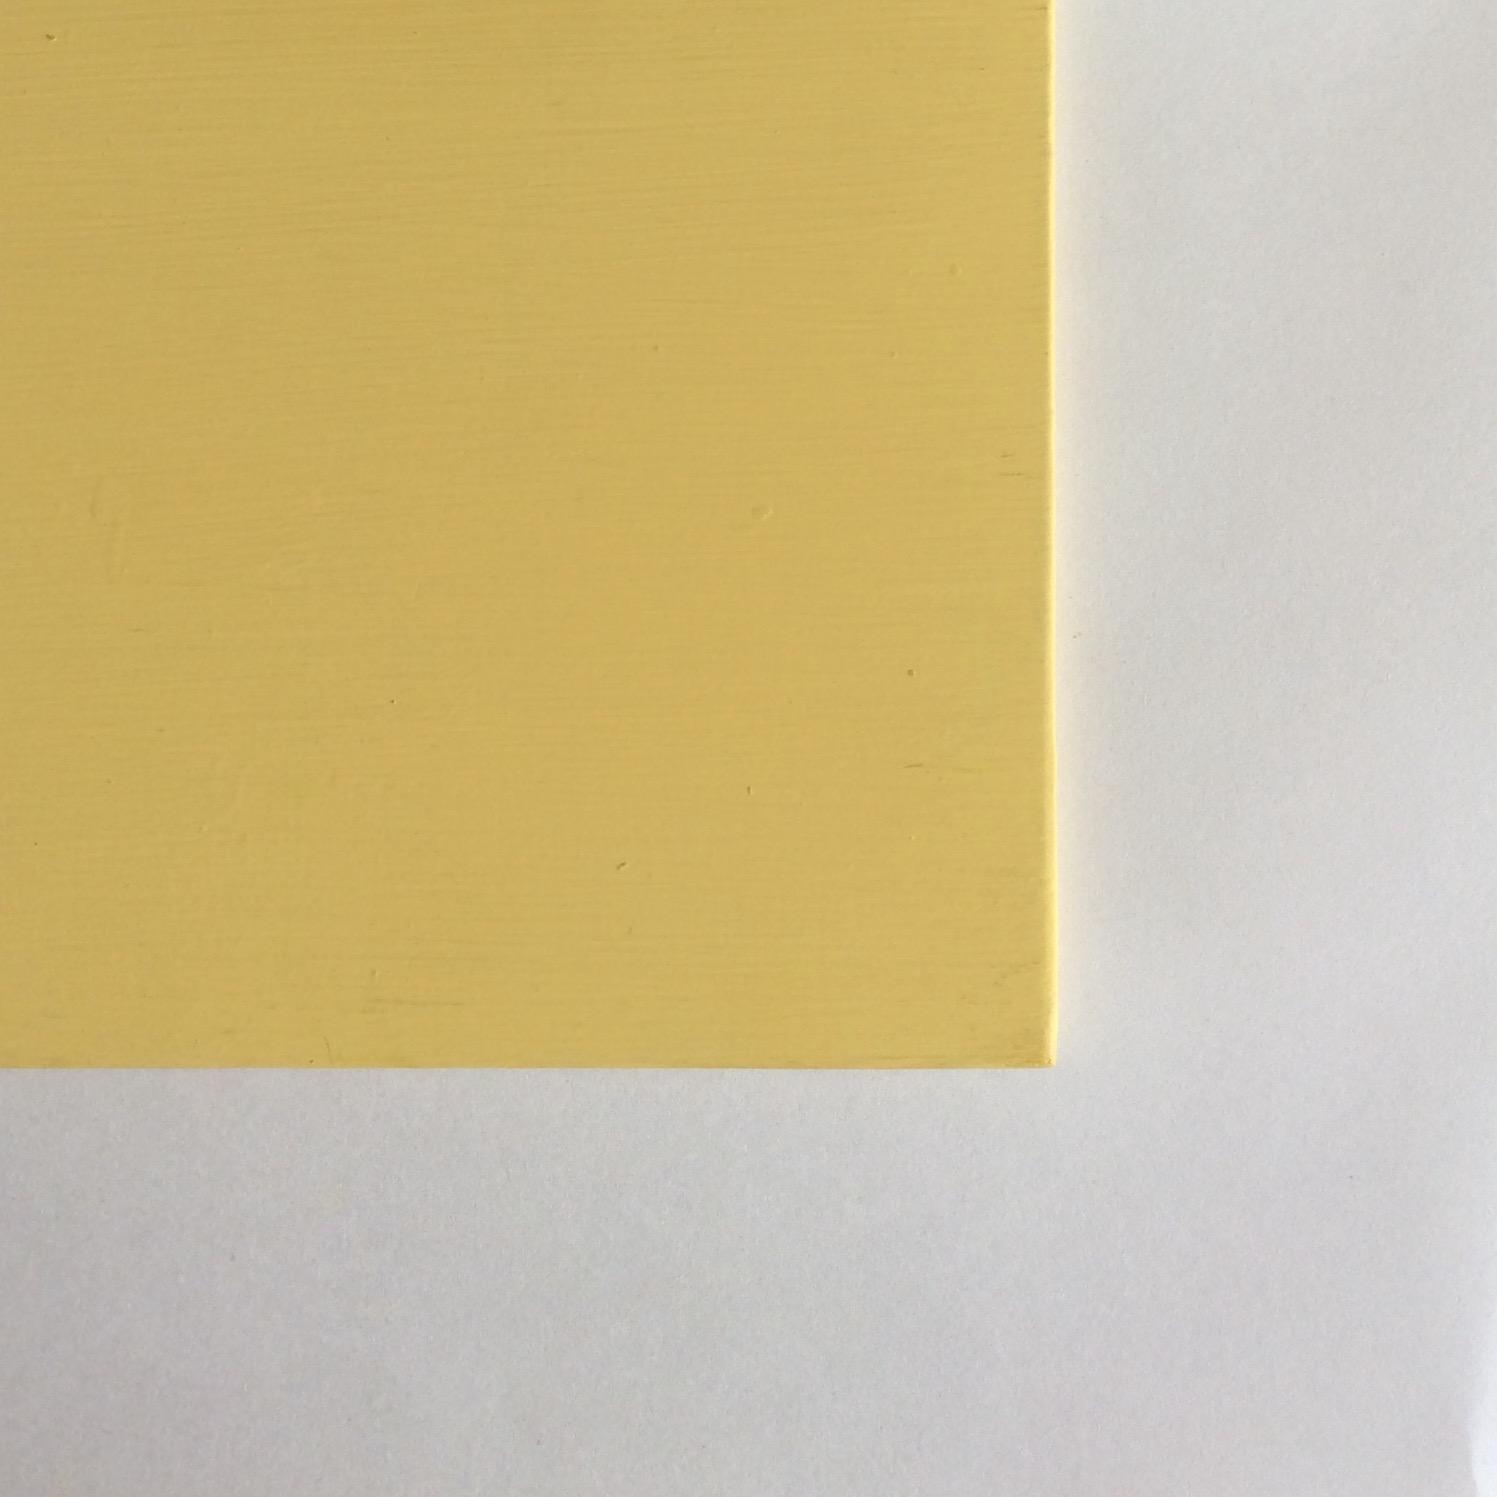 Jackson's Yellow